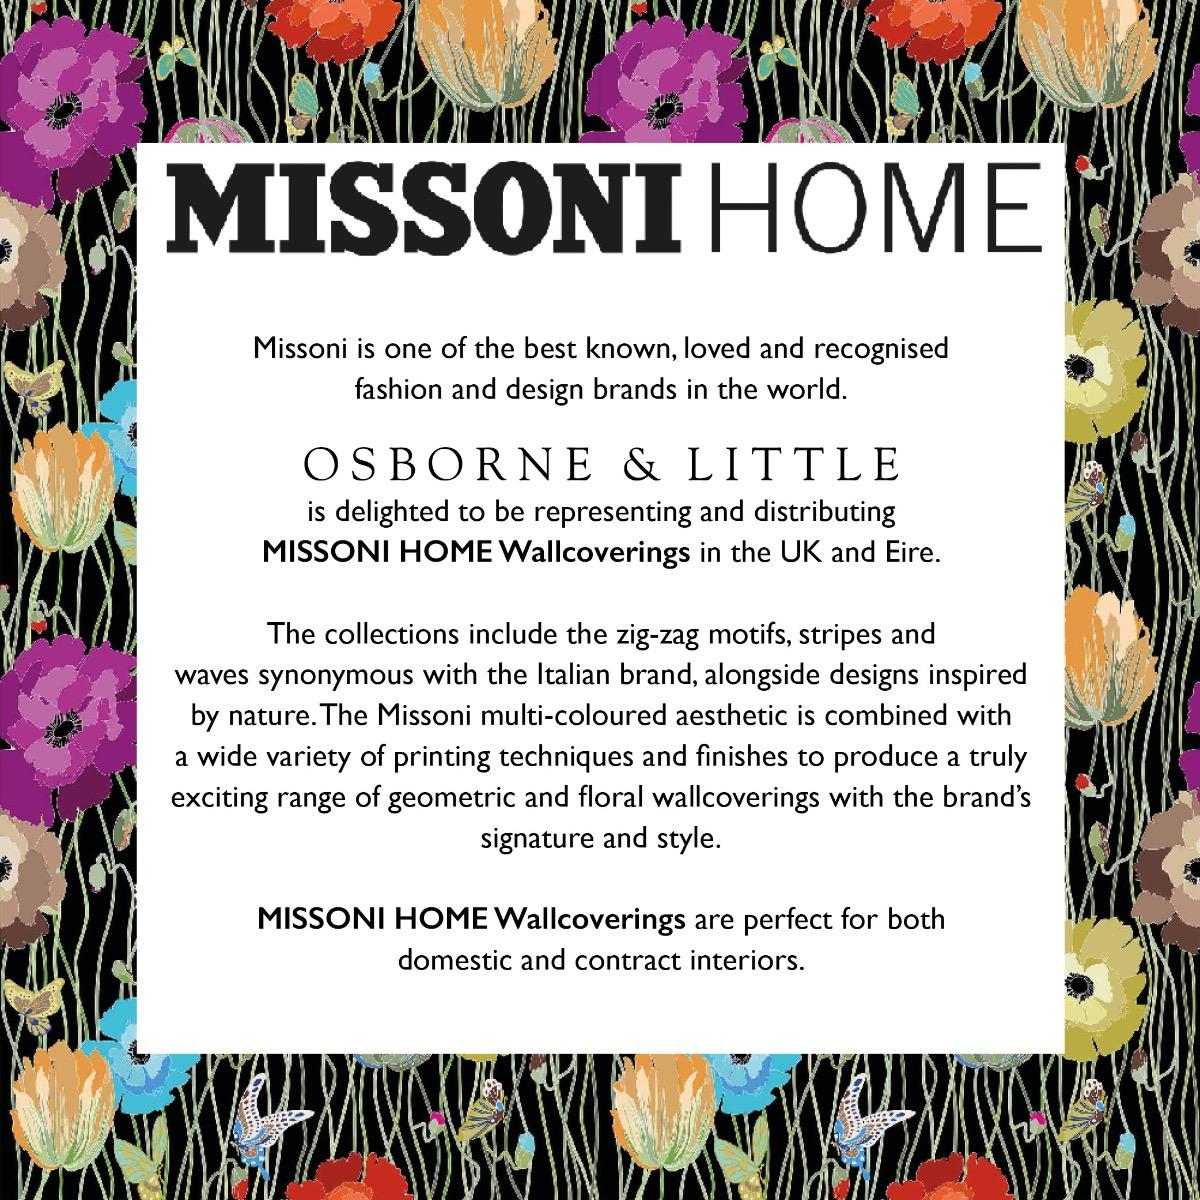 MISSONI HOME WALLCOVERINGS